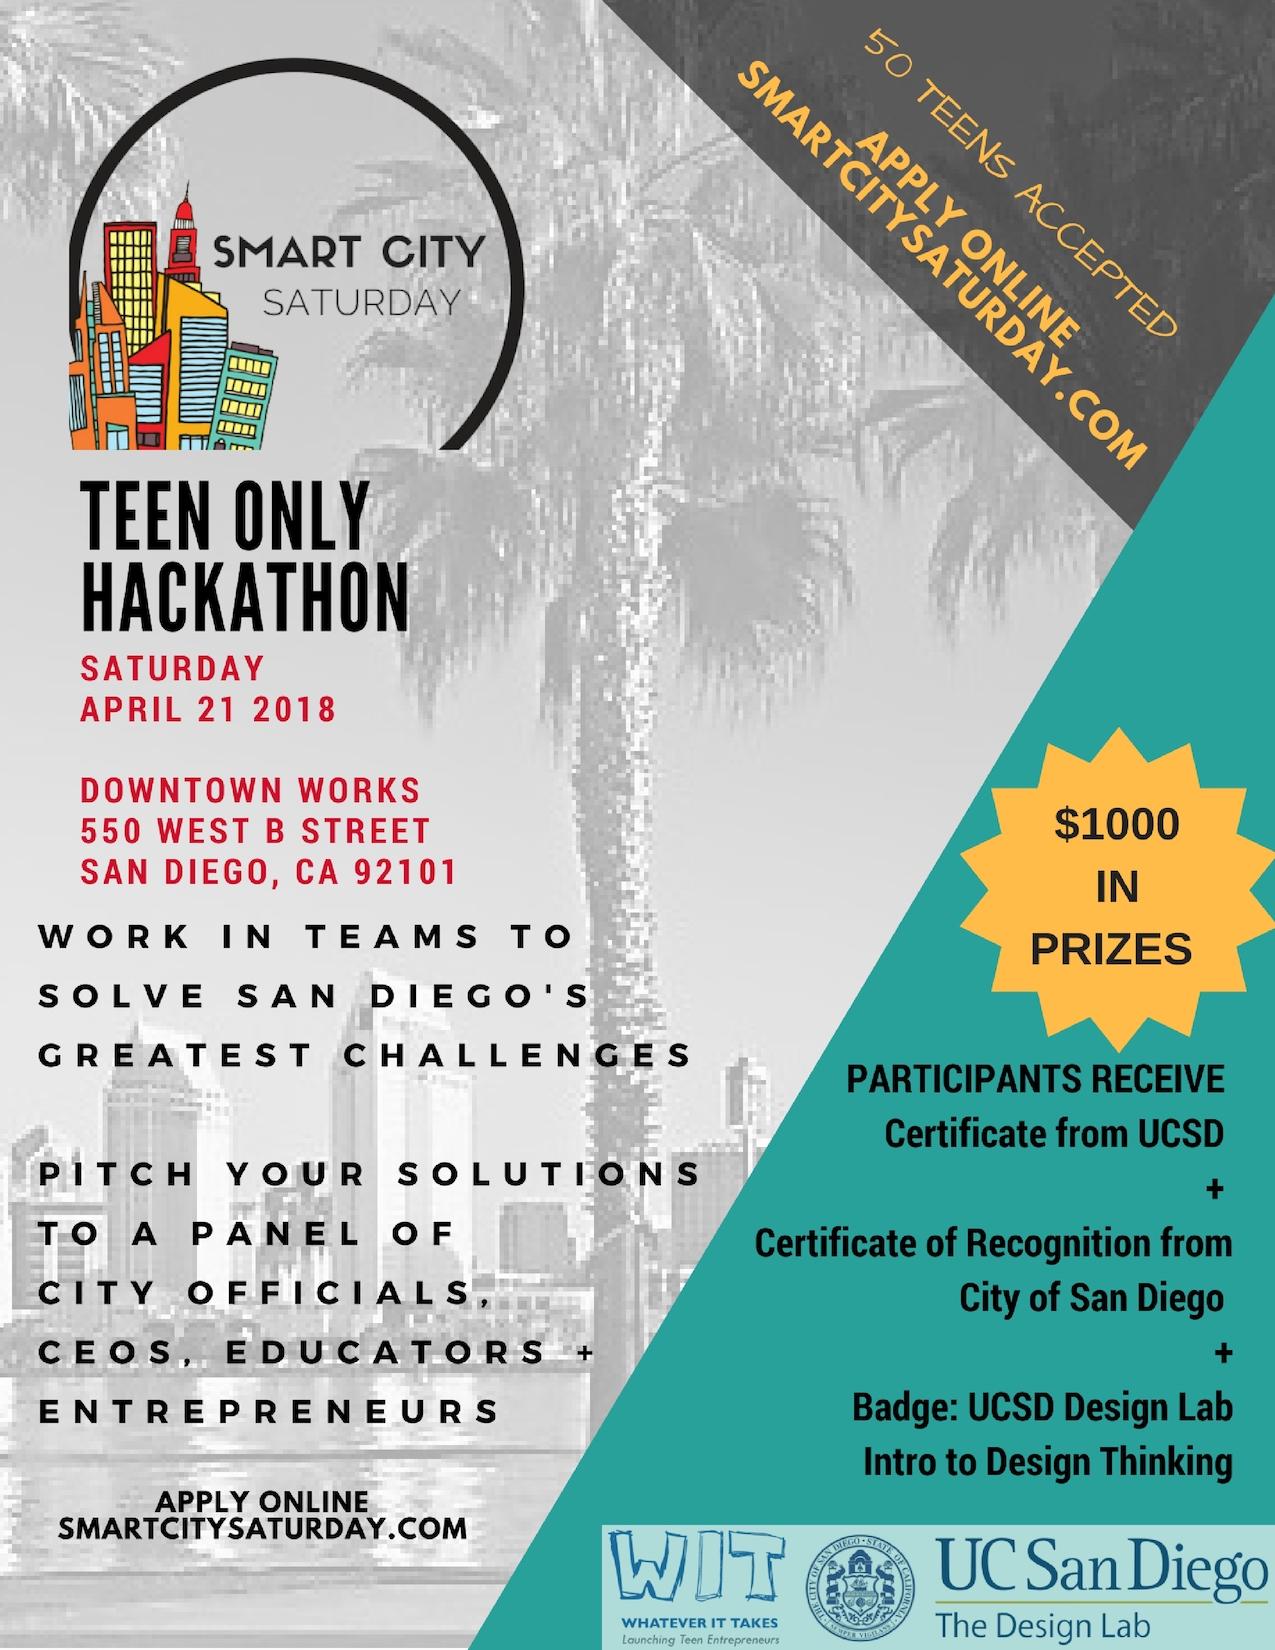 Smart City Saturday